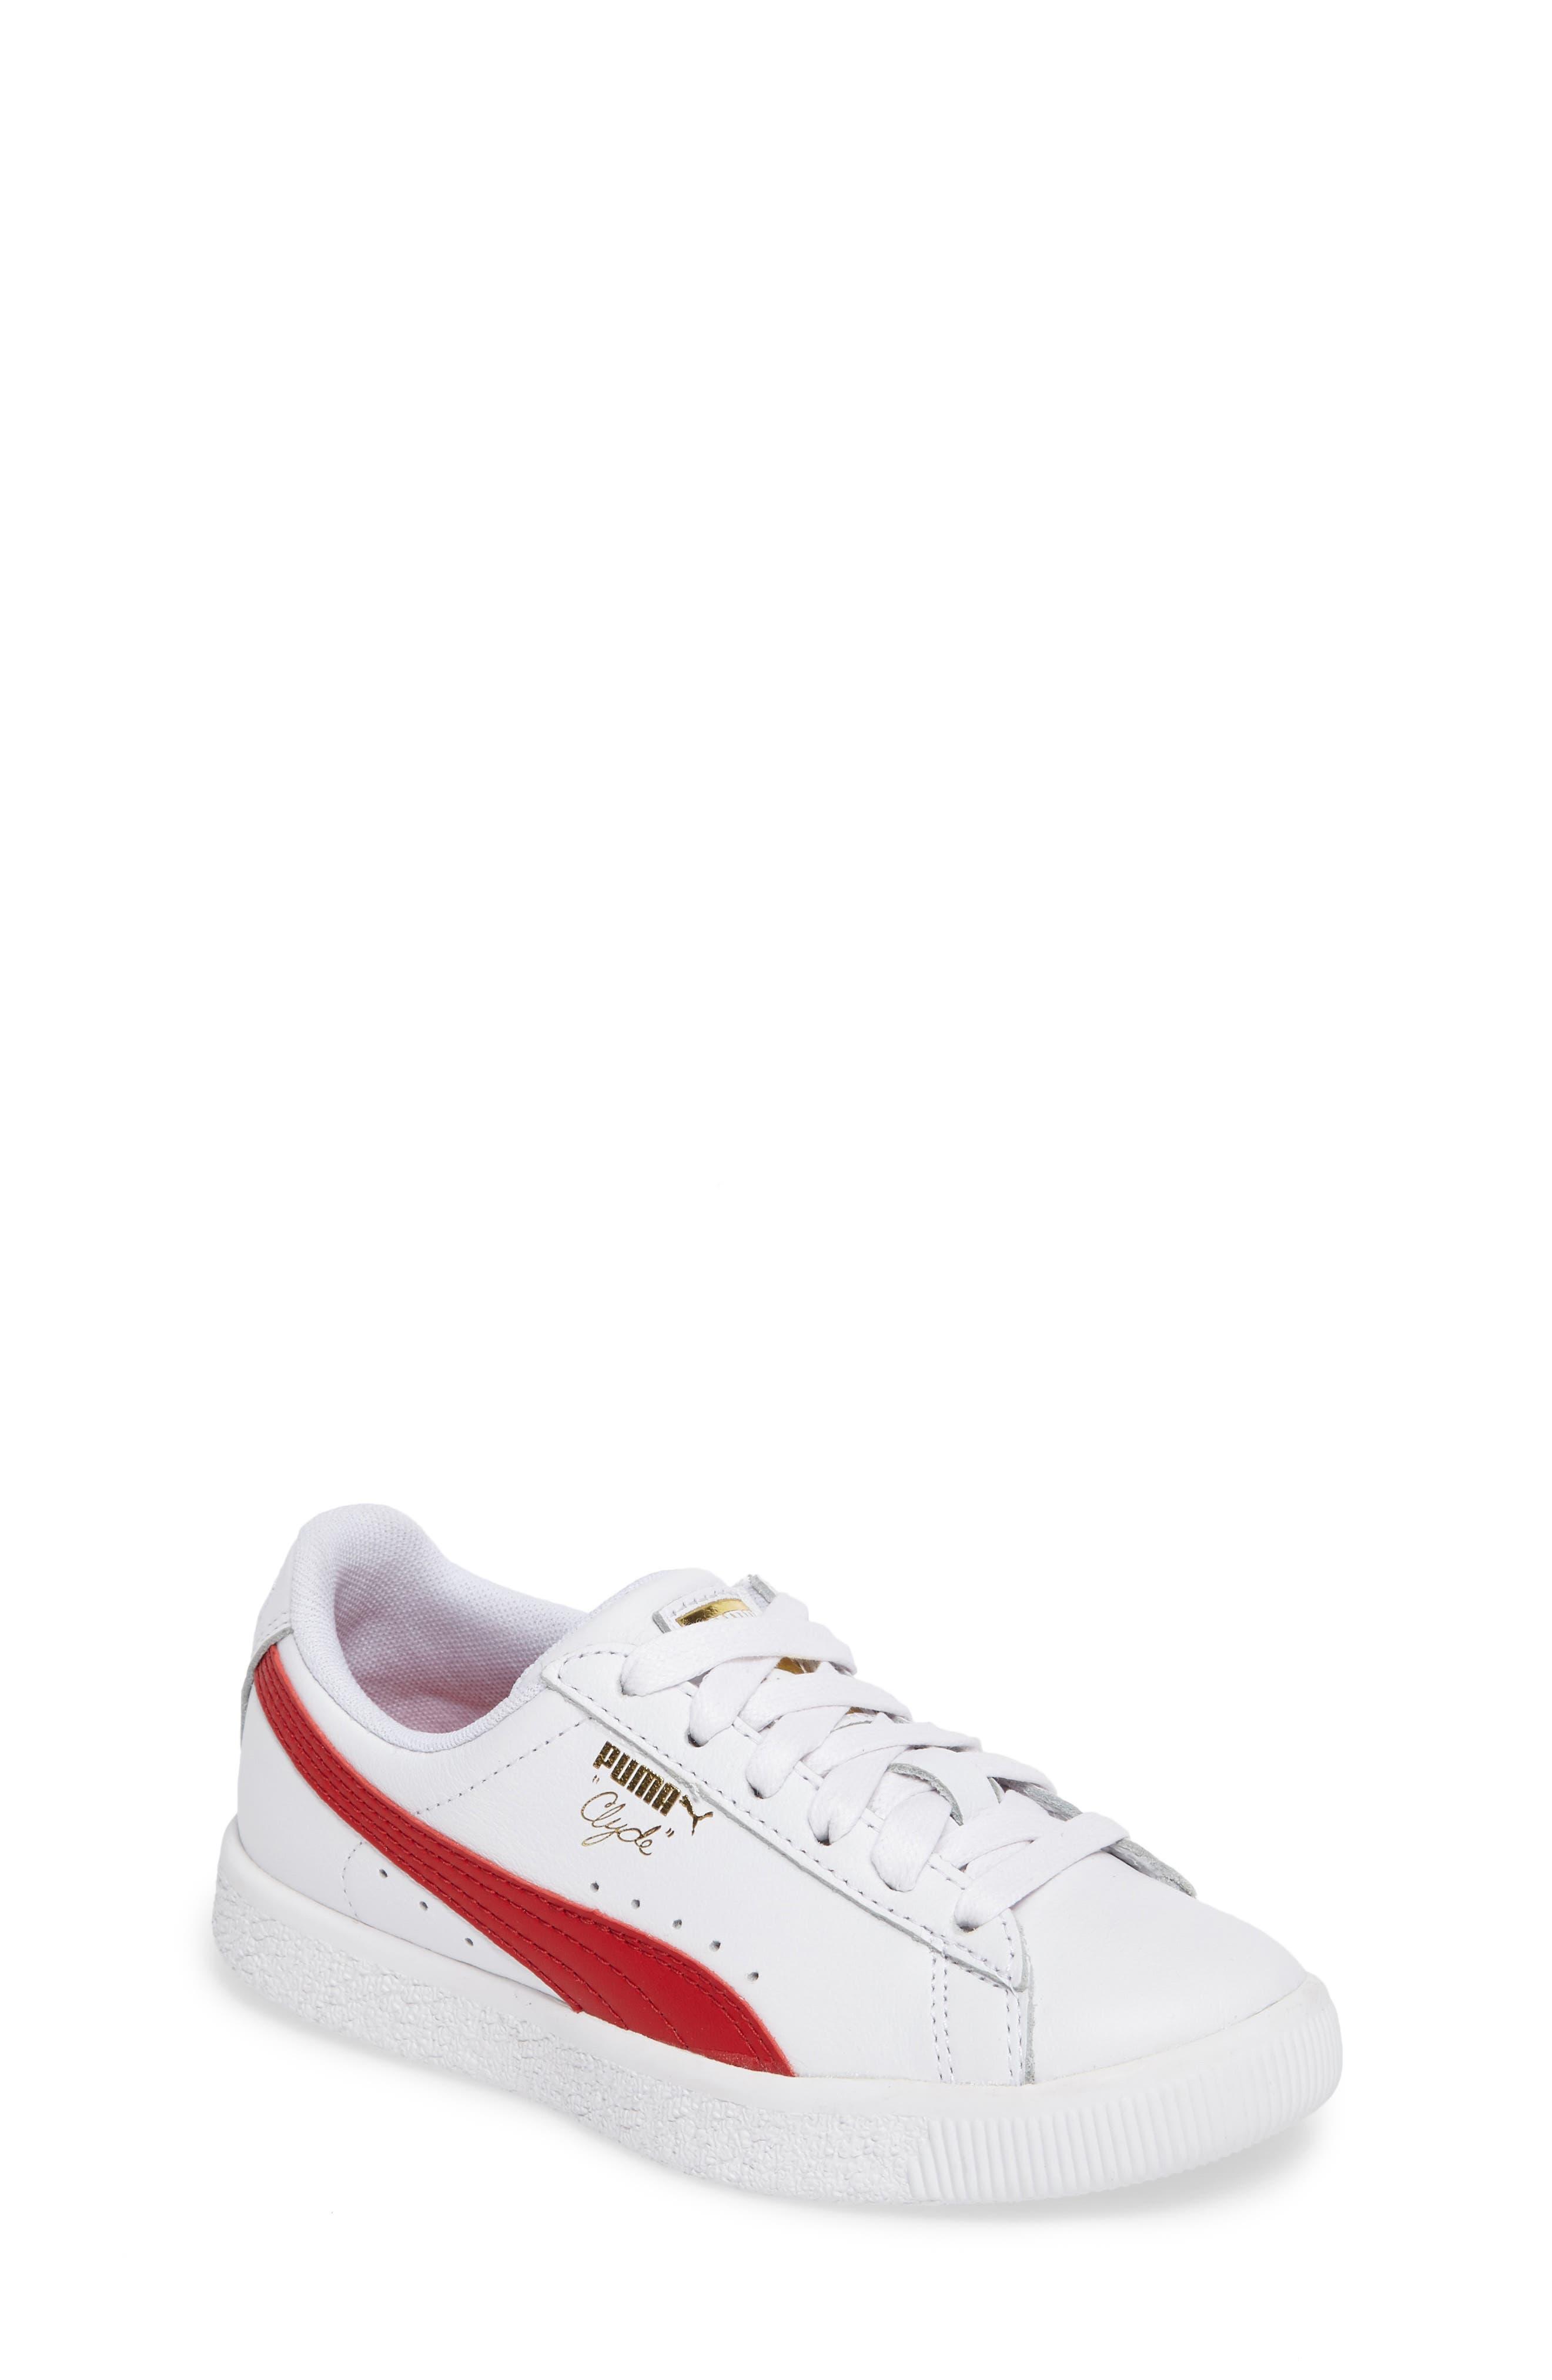 PUMA Clyde Core Foil Sneaker (Toddler, Little Kid & Big Kid)